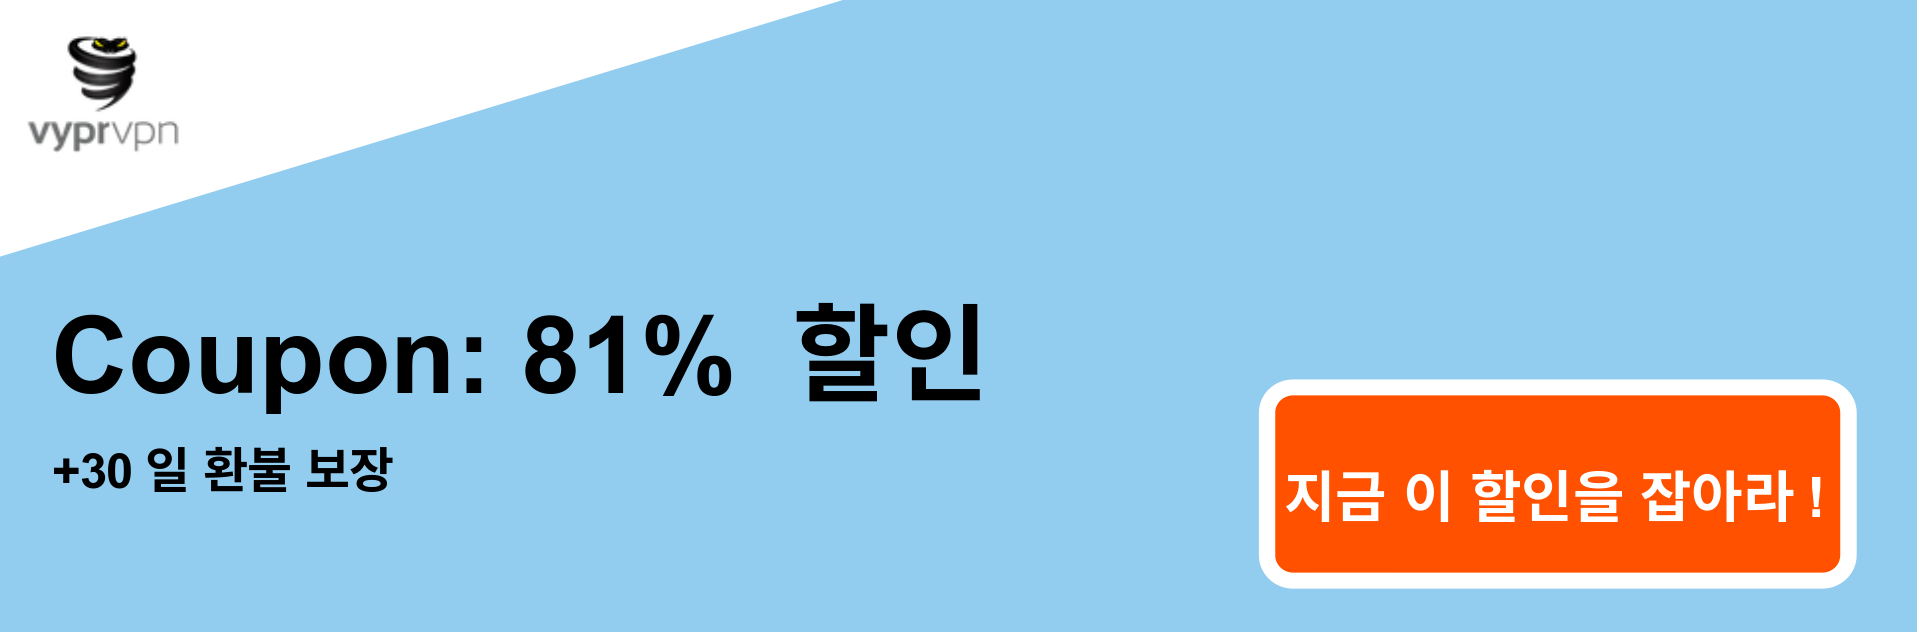 Vypr VPN 쿠폰 배너-81 % 할인